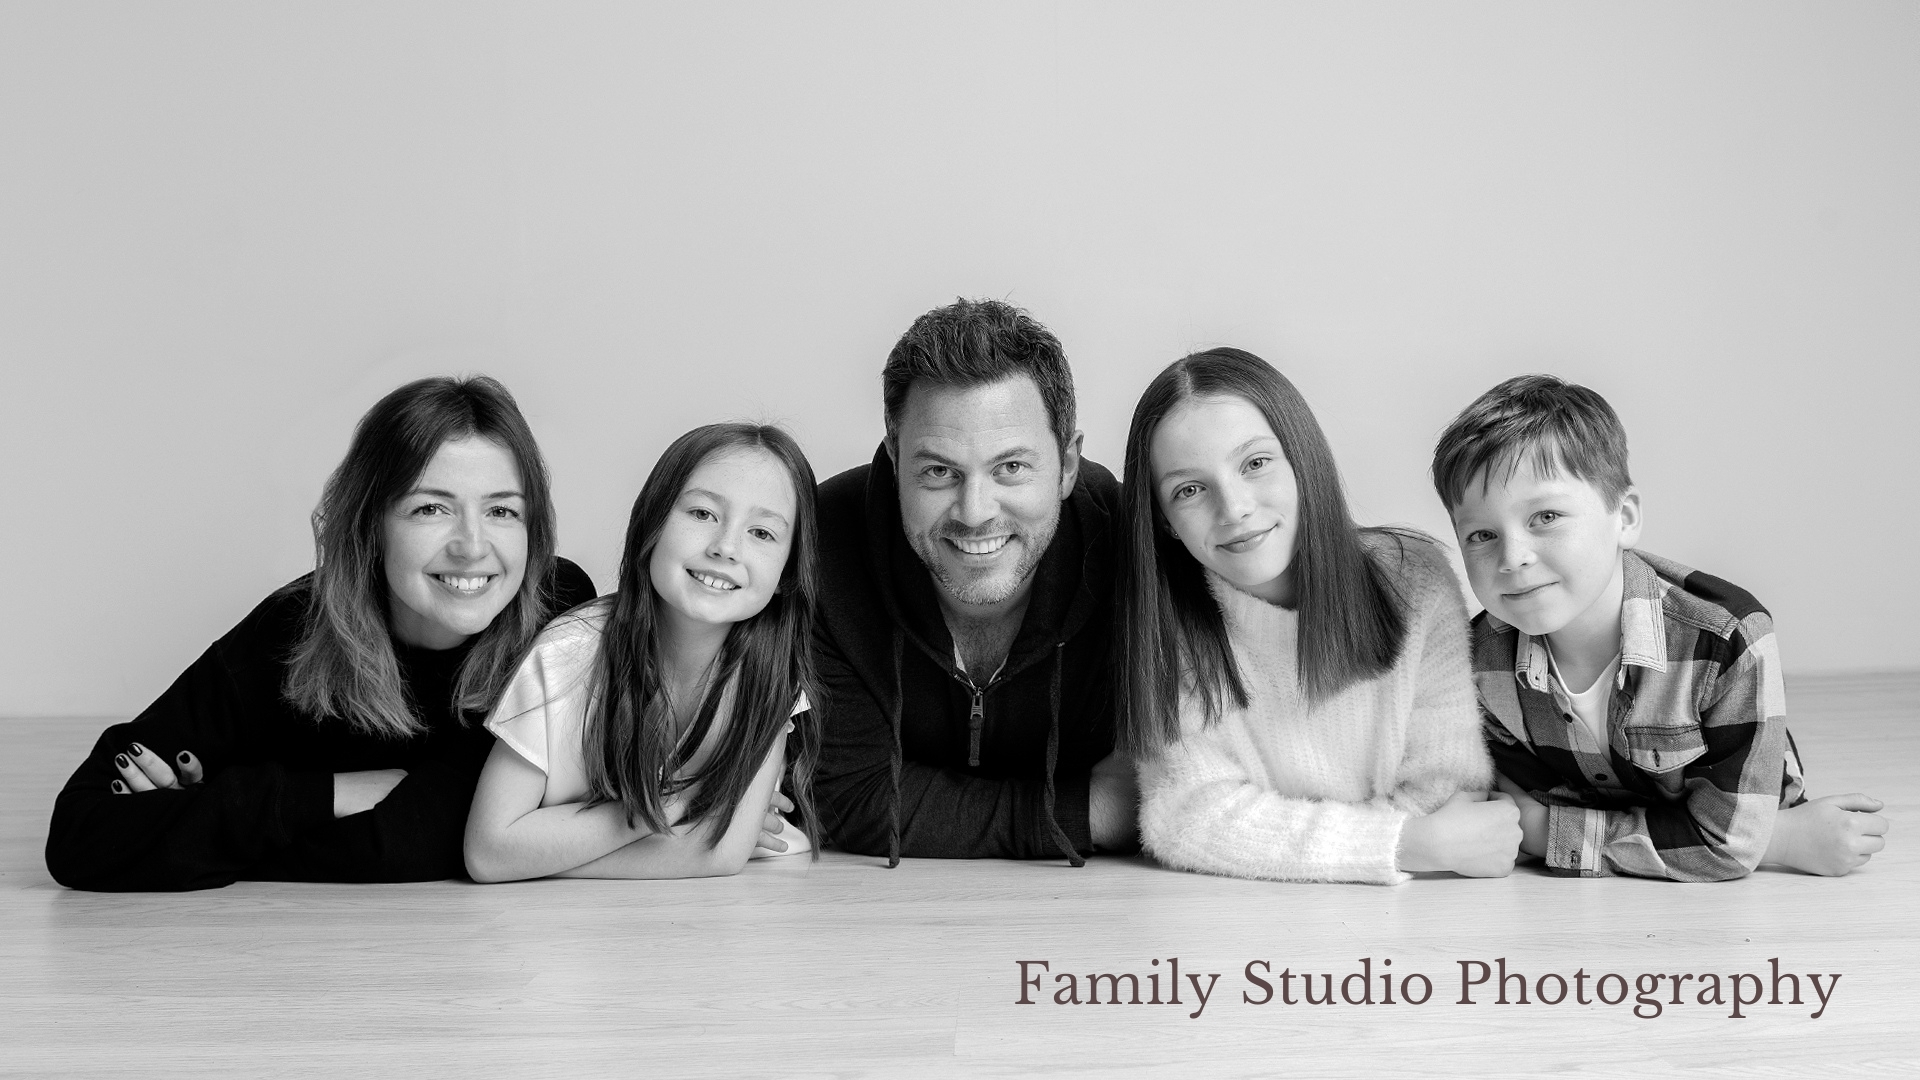 Darlington-Family-Studio-Photography- Stan-Seaton-Photography-2.jpg